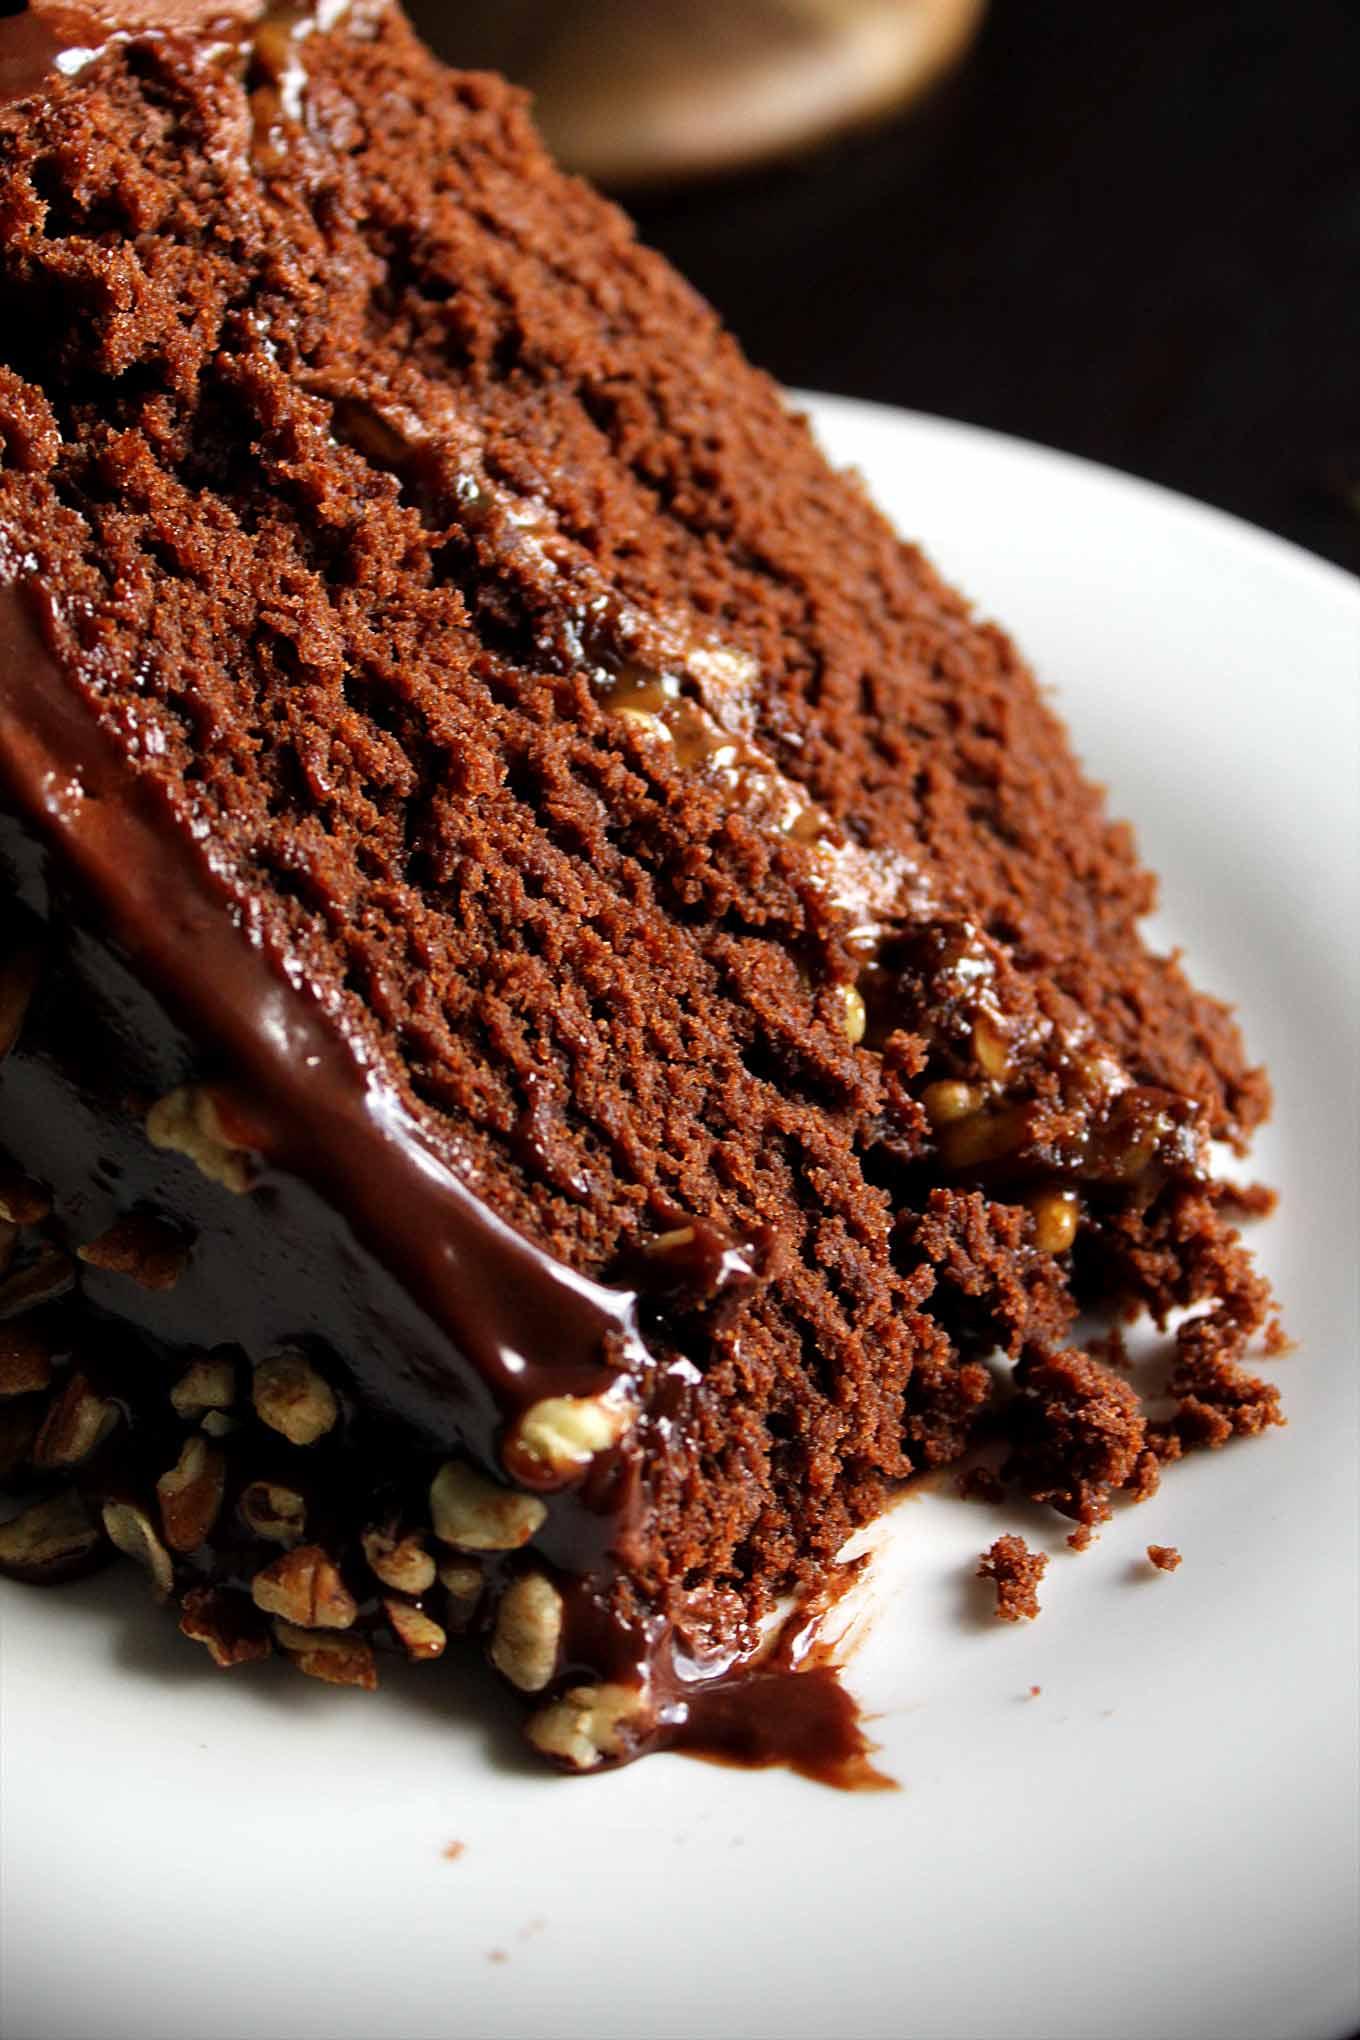 Chocolate Turtle Cake with Caramel Pecans and Chocolate Ganache ...